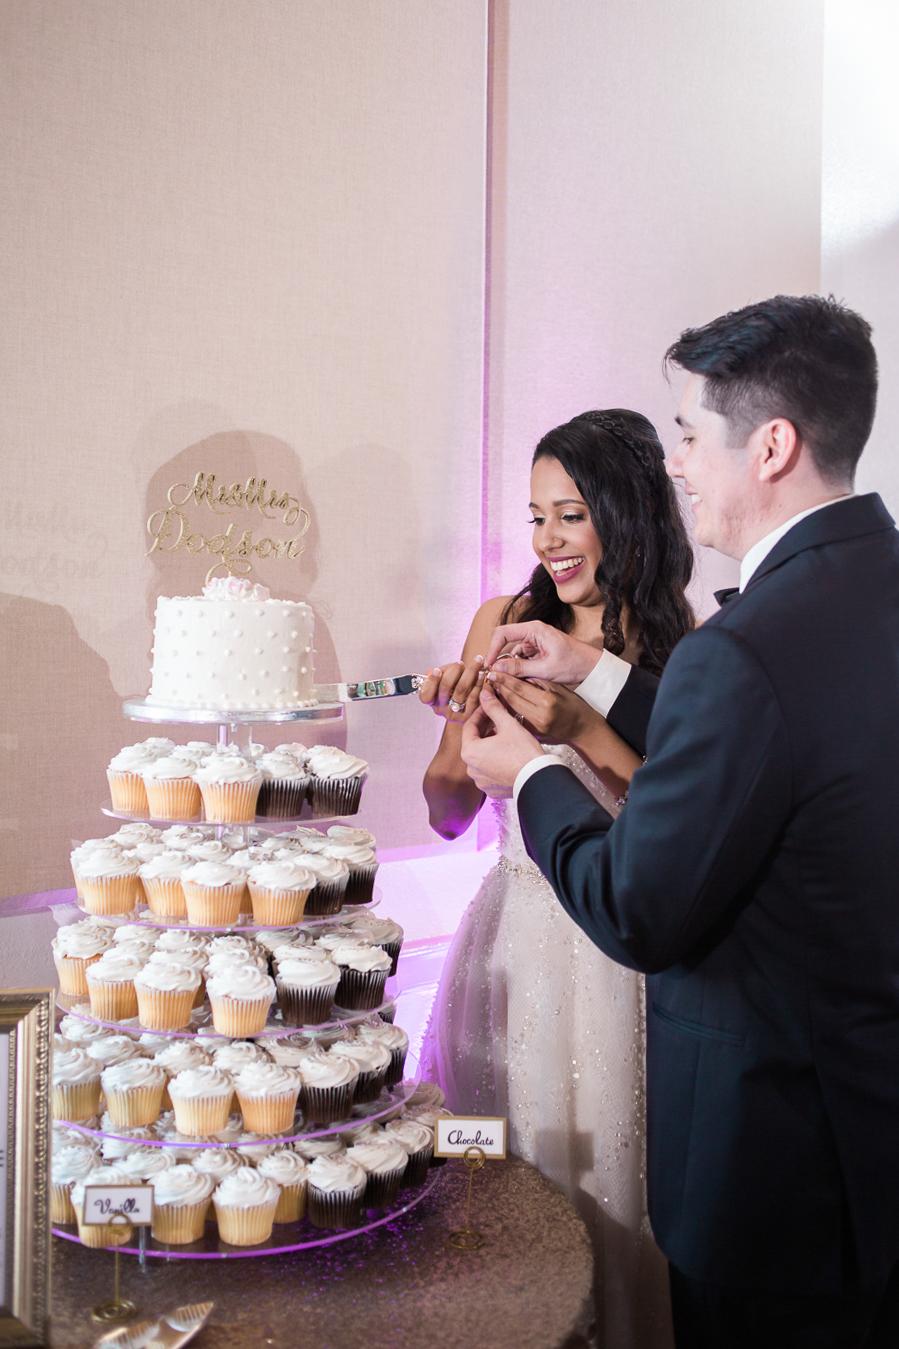 cutting the cake-1.jpg